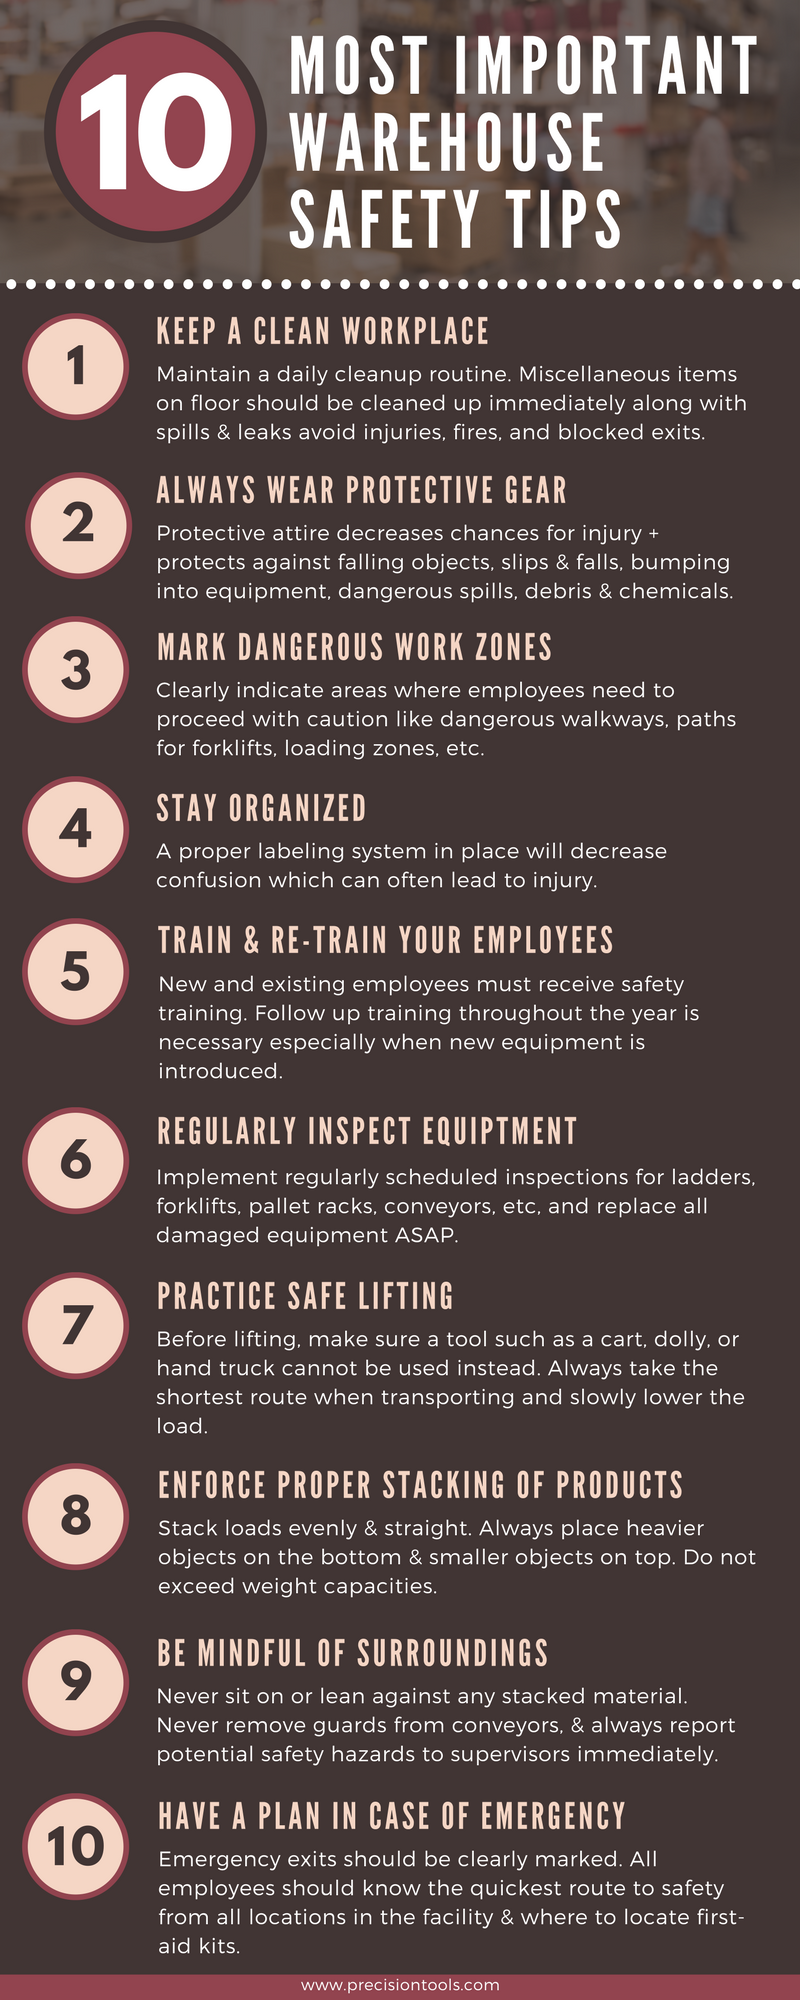 Warehouse Safety Tips Safety tips, Safety, Tips